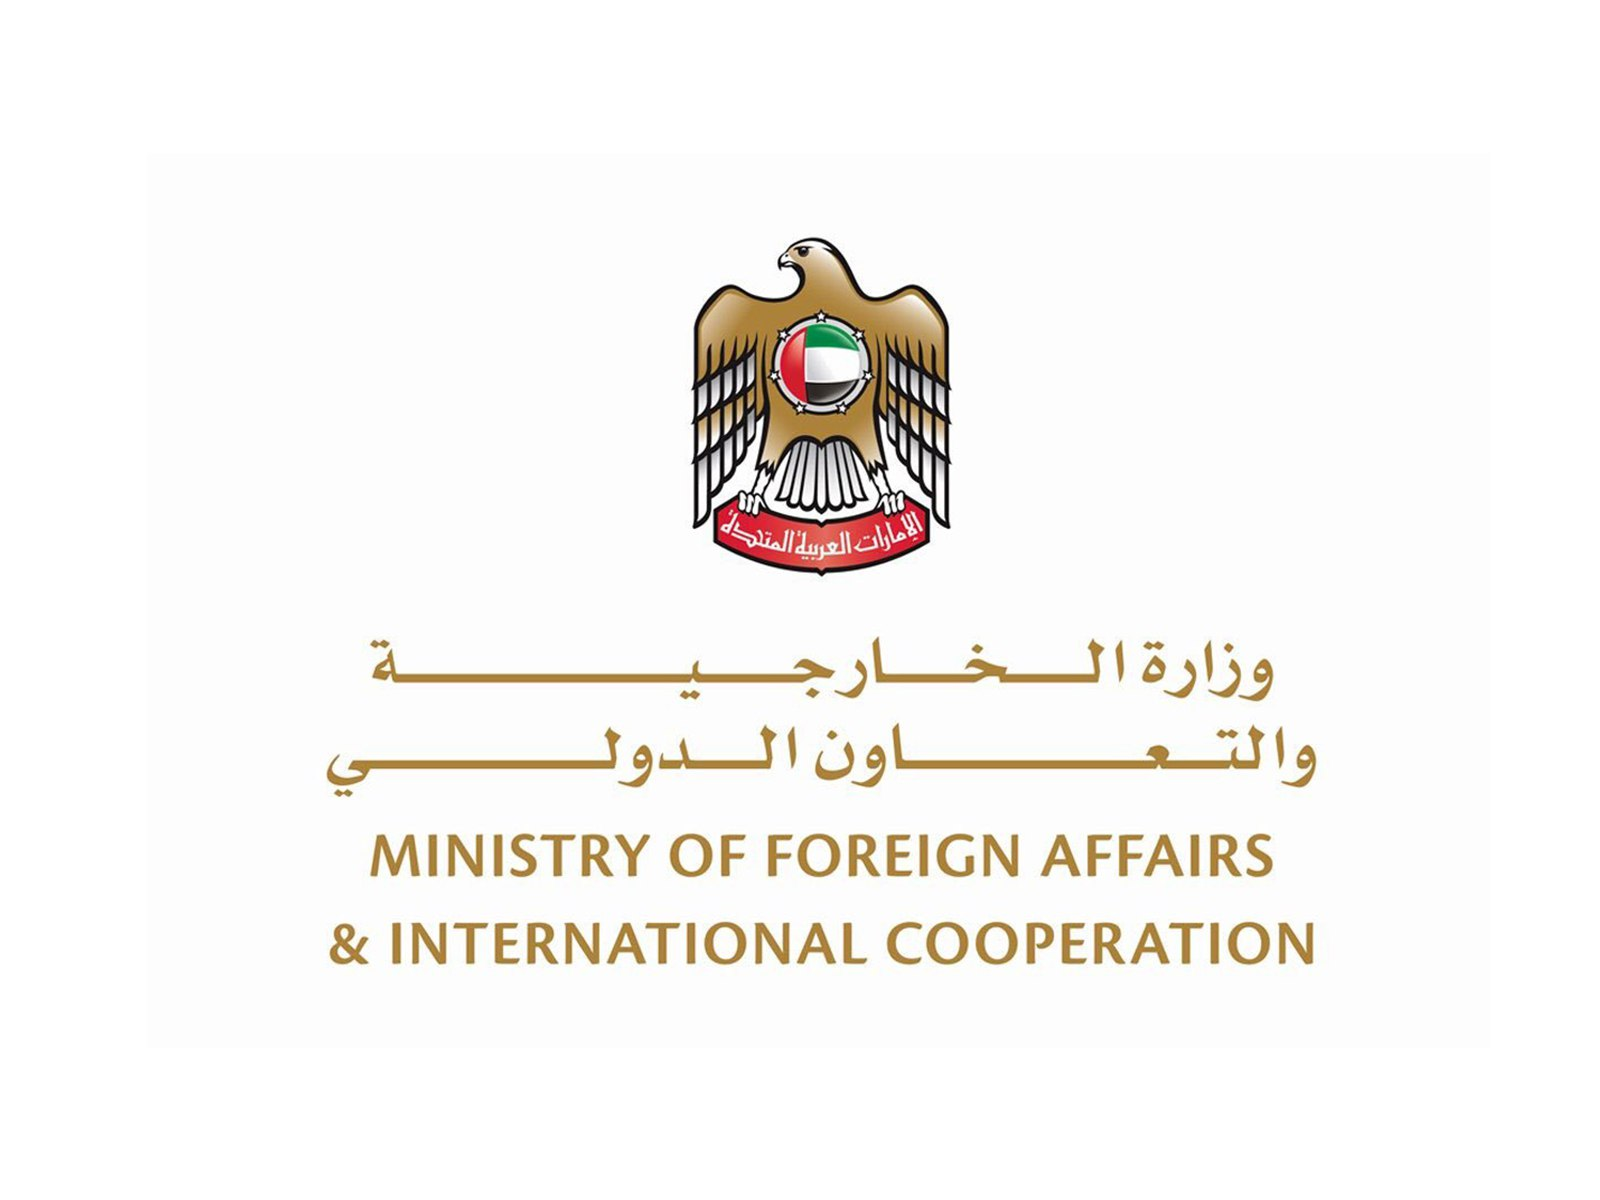 UAE evacuates Emirati citizens from several countries amid COVID-19 outbreak